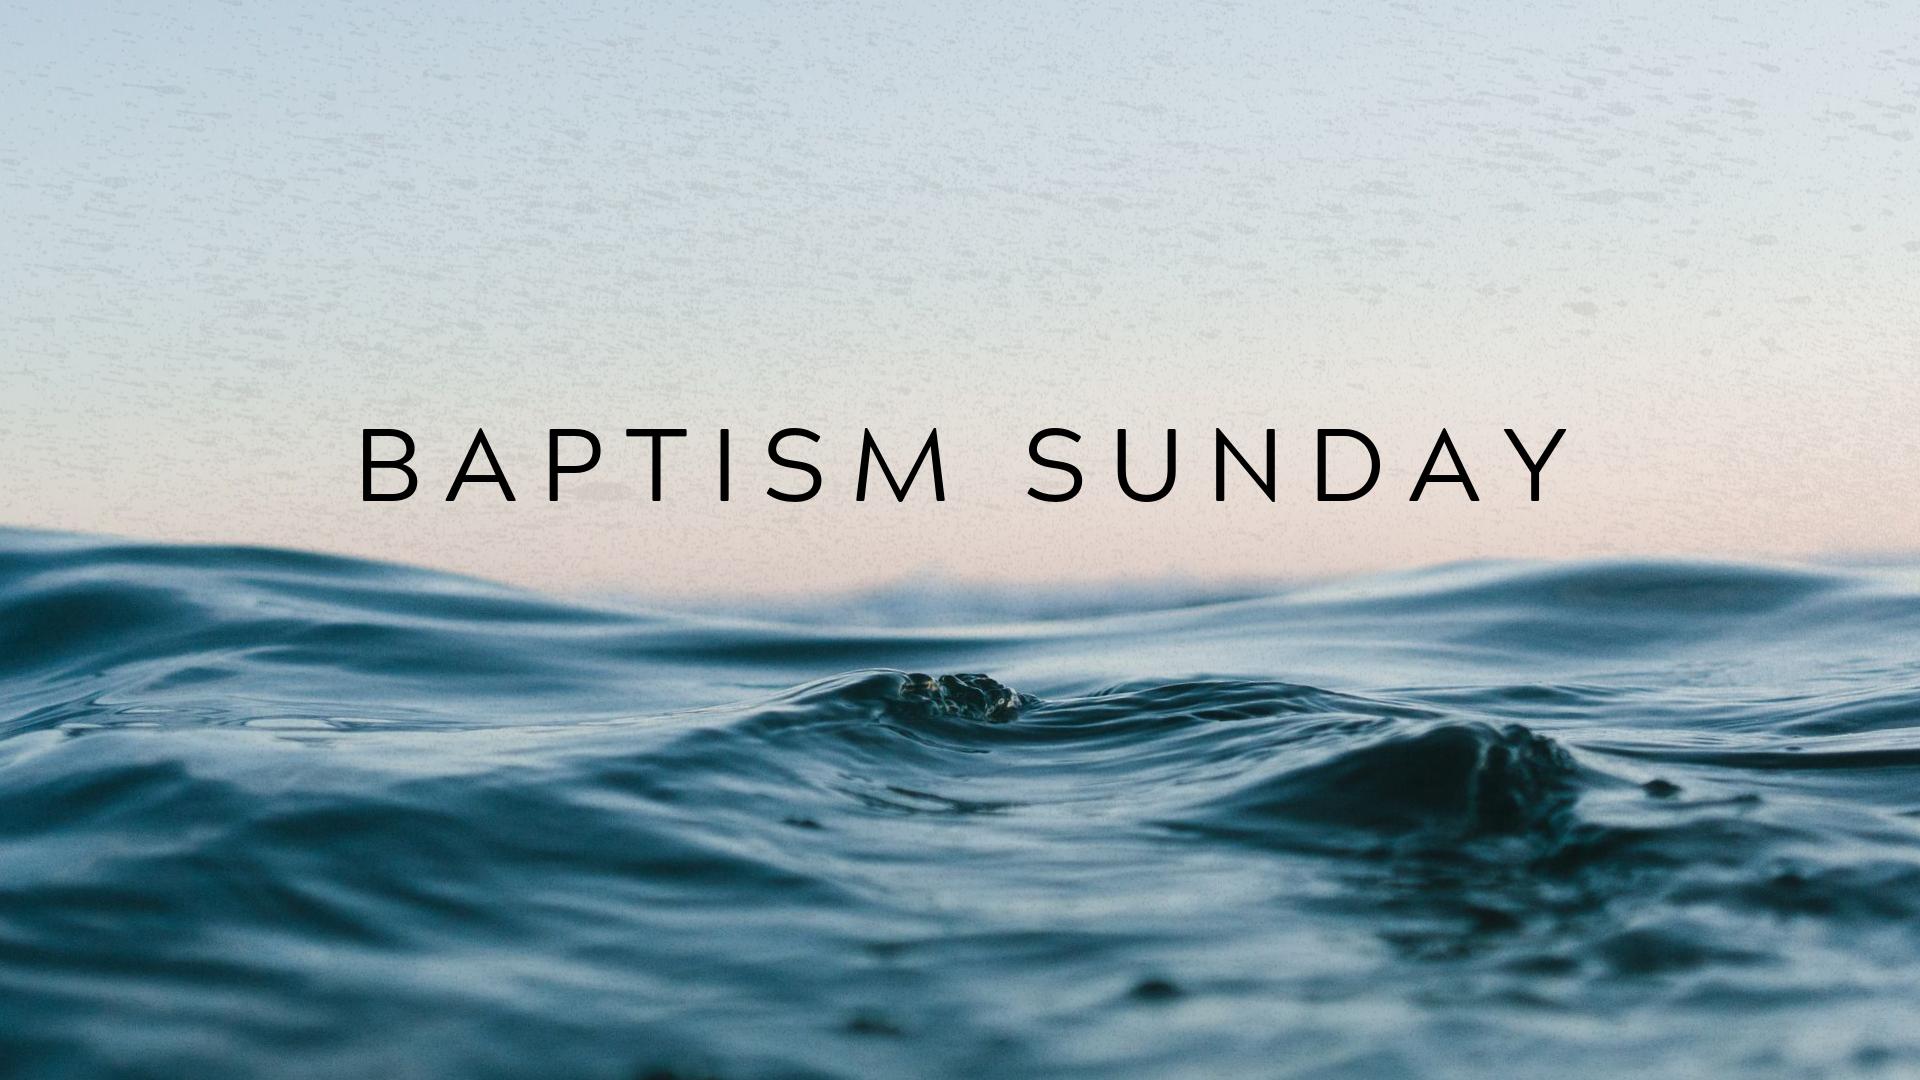 Copy of BAPTISM SUNDAY.png